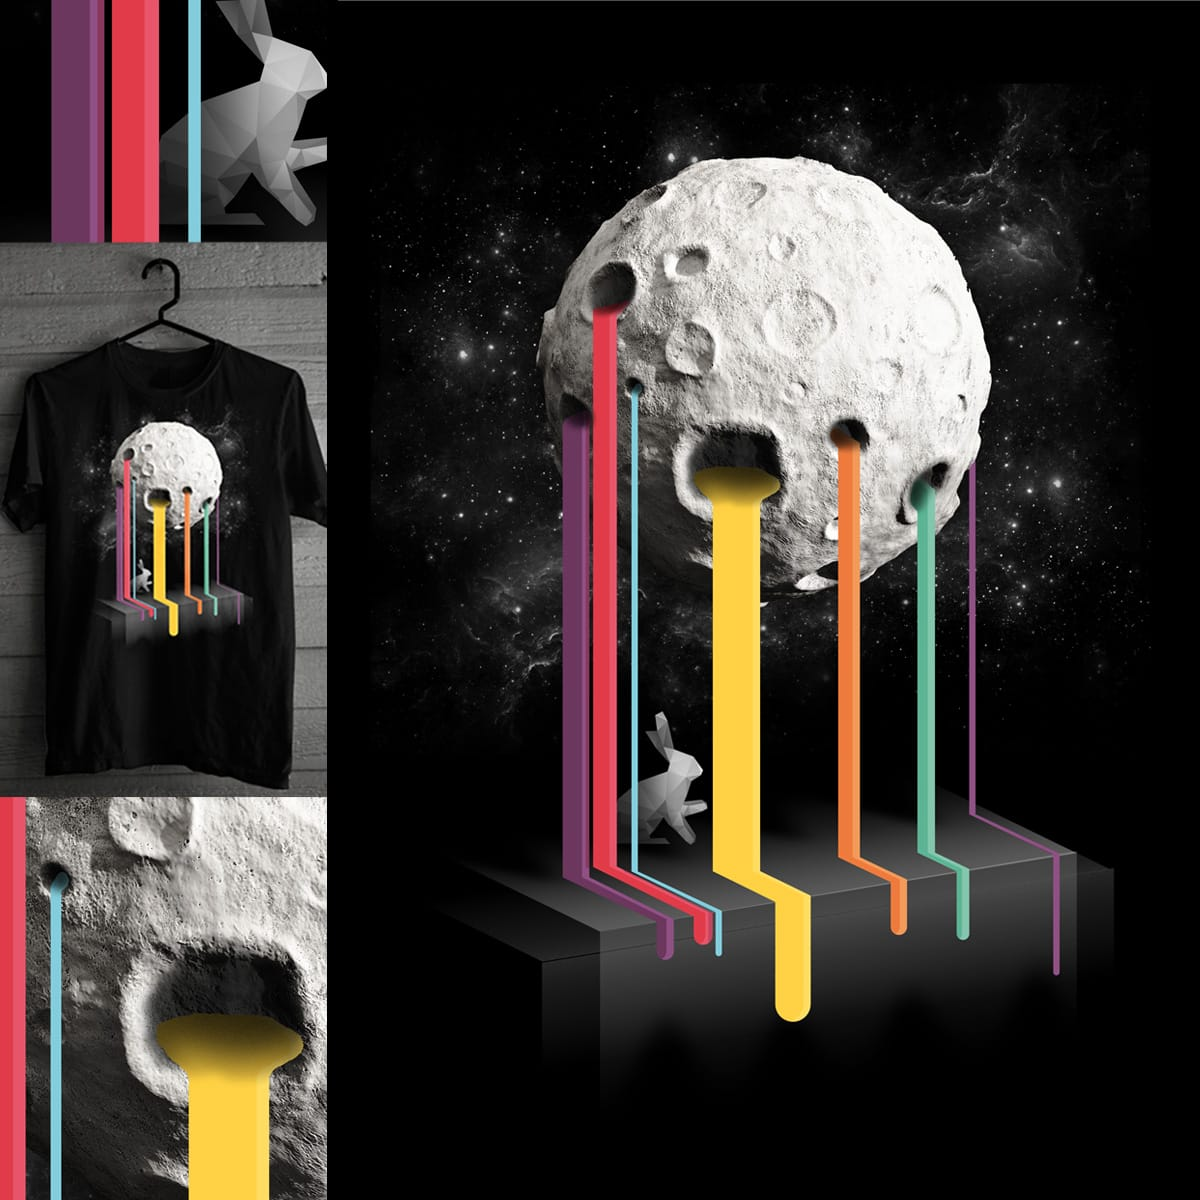 Melting Moon by D-maker on Threadless